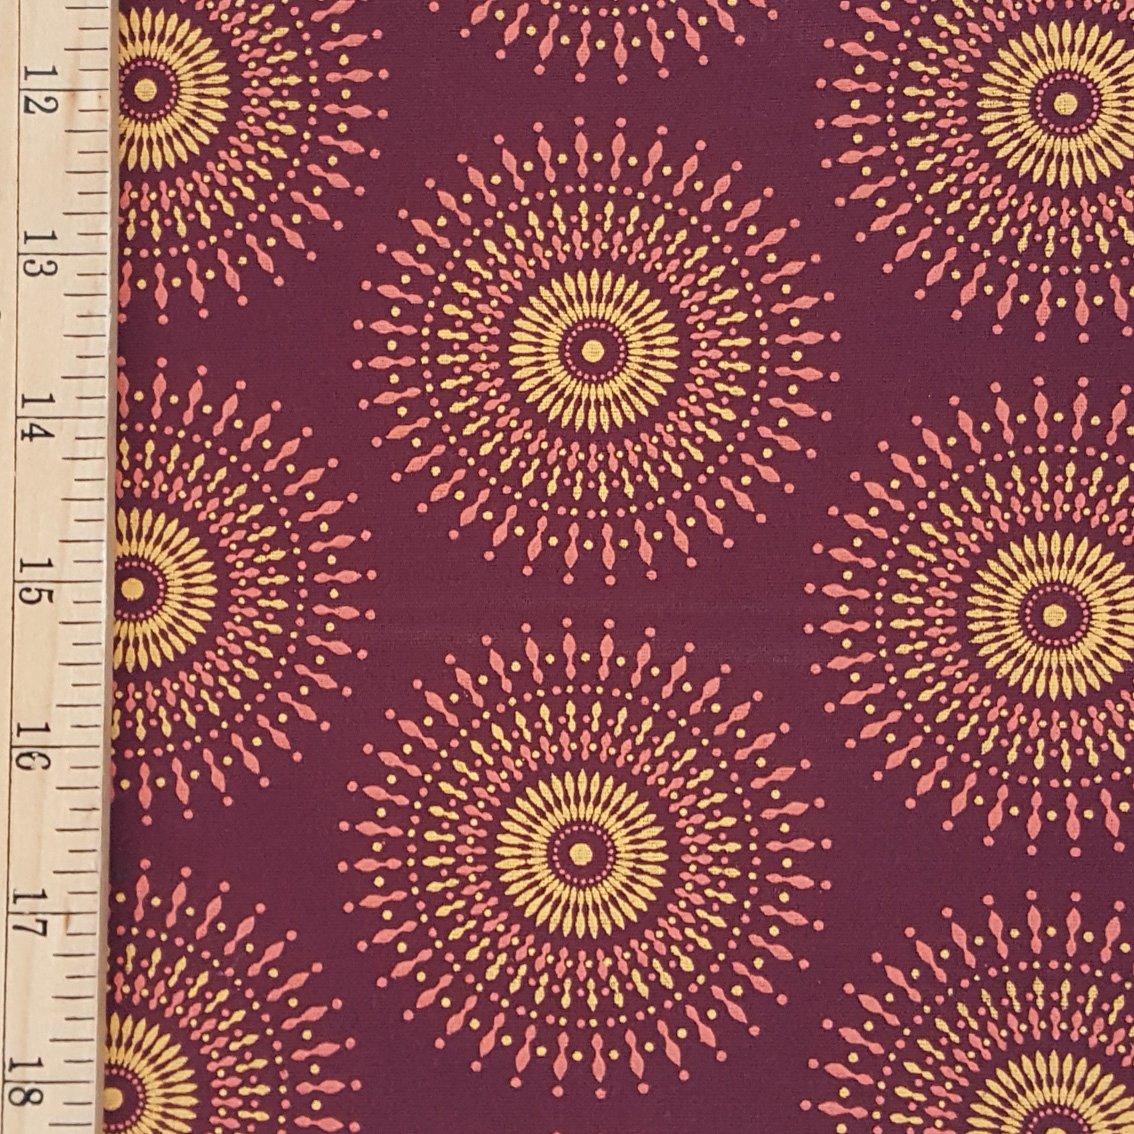 Da Gama Burgundy and Gold Sunburst fabric (1407)